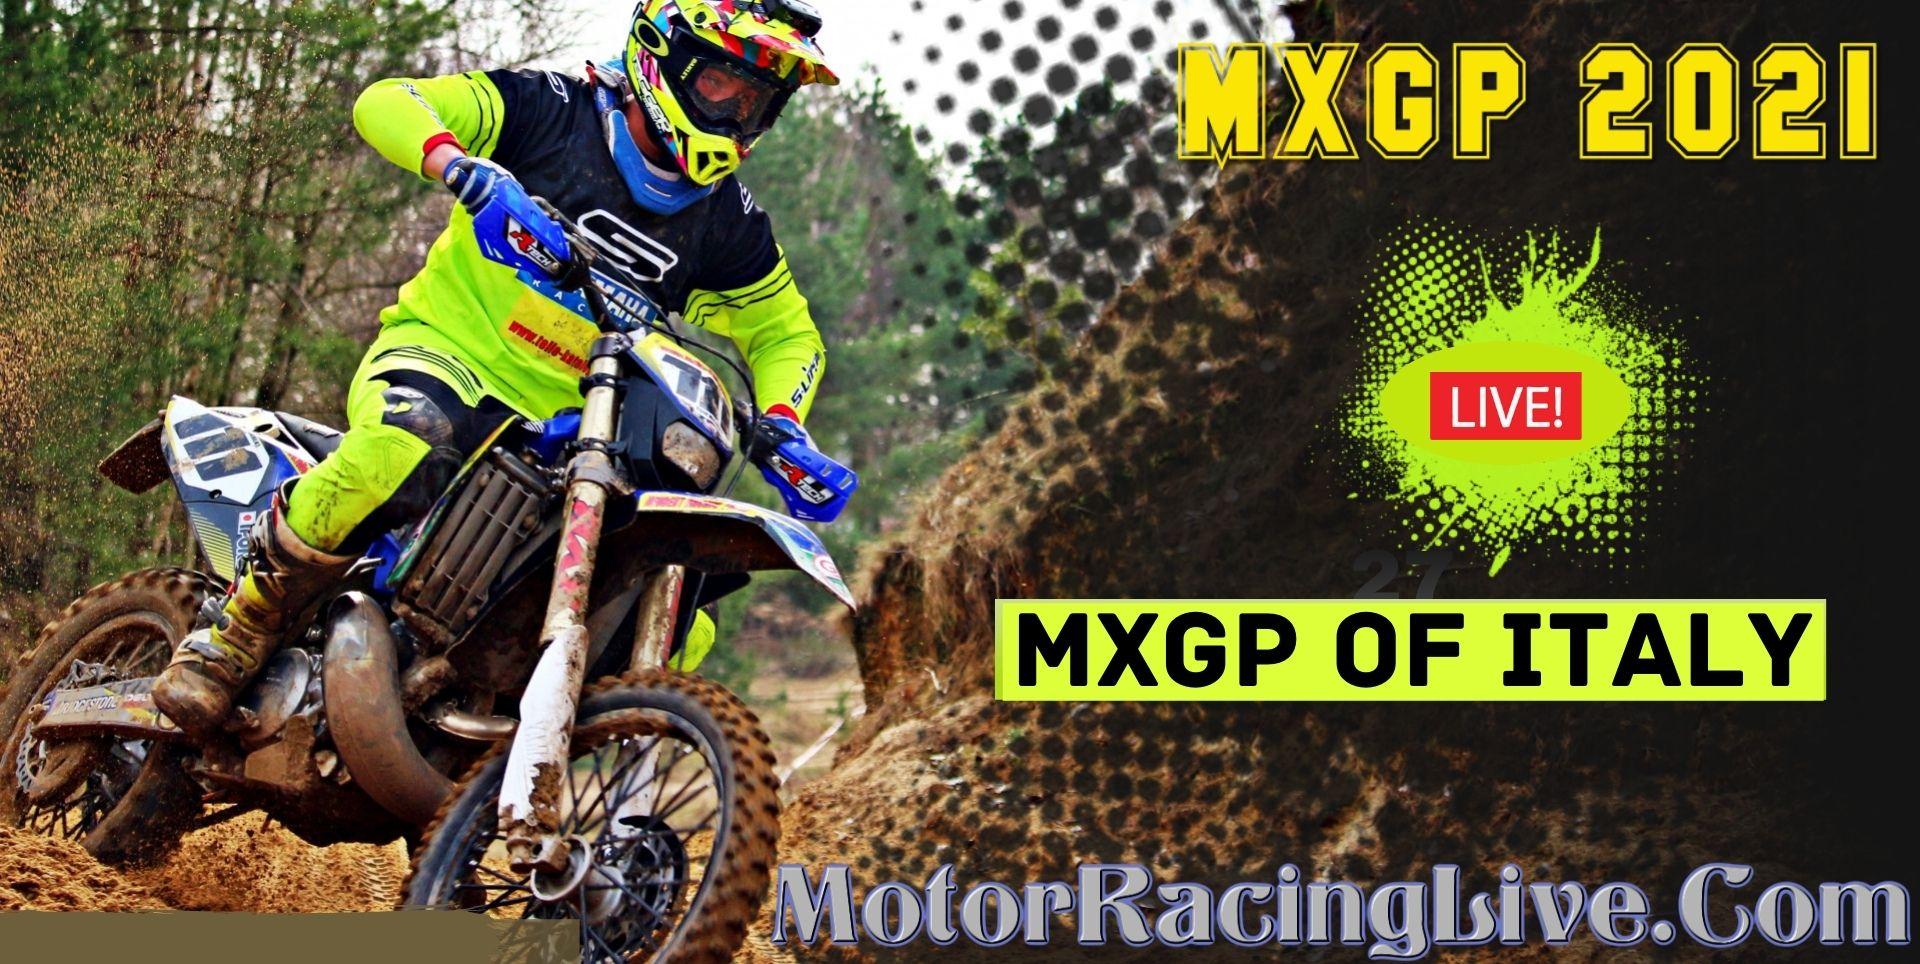 MXGP OF ITALY 2021 Live Stream